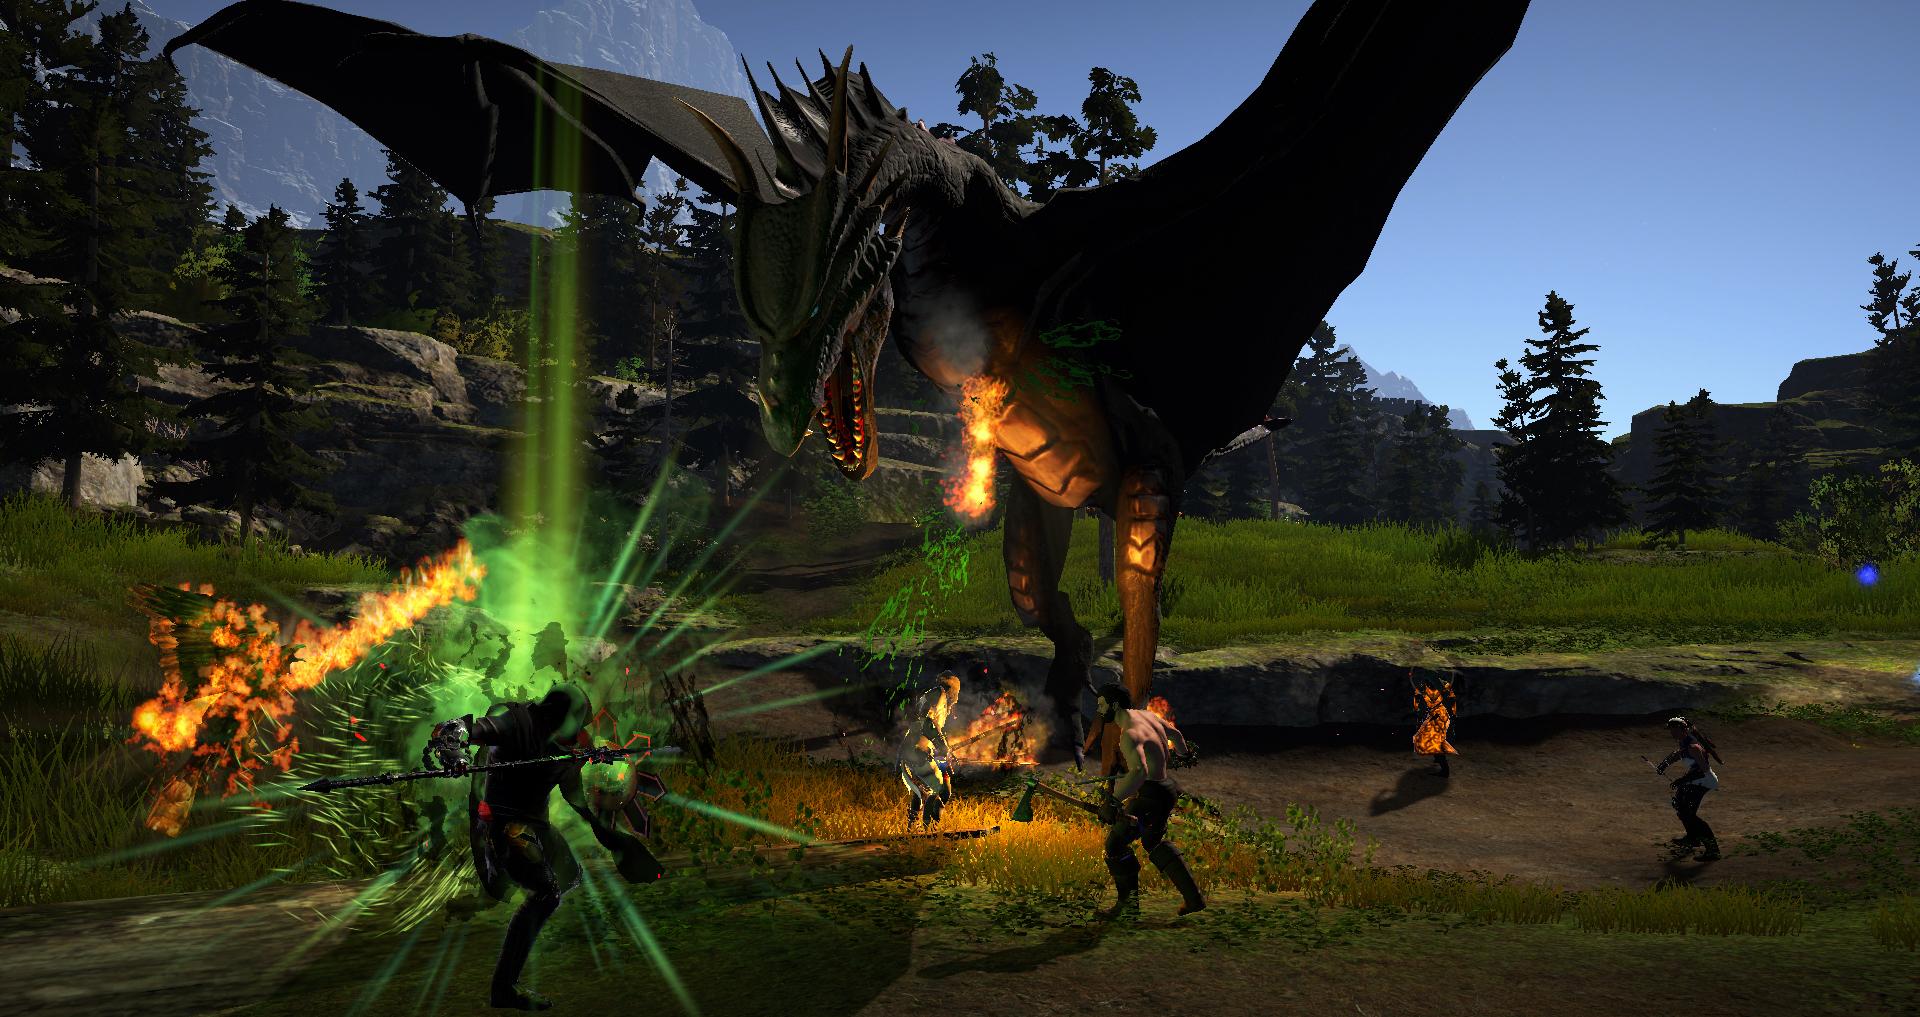 avatar pc game keygen free download